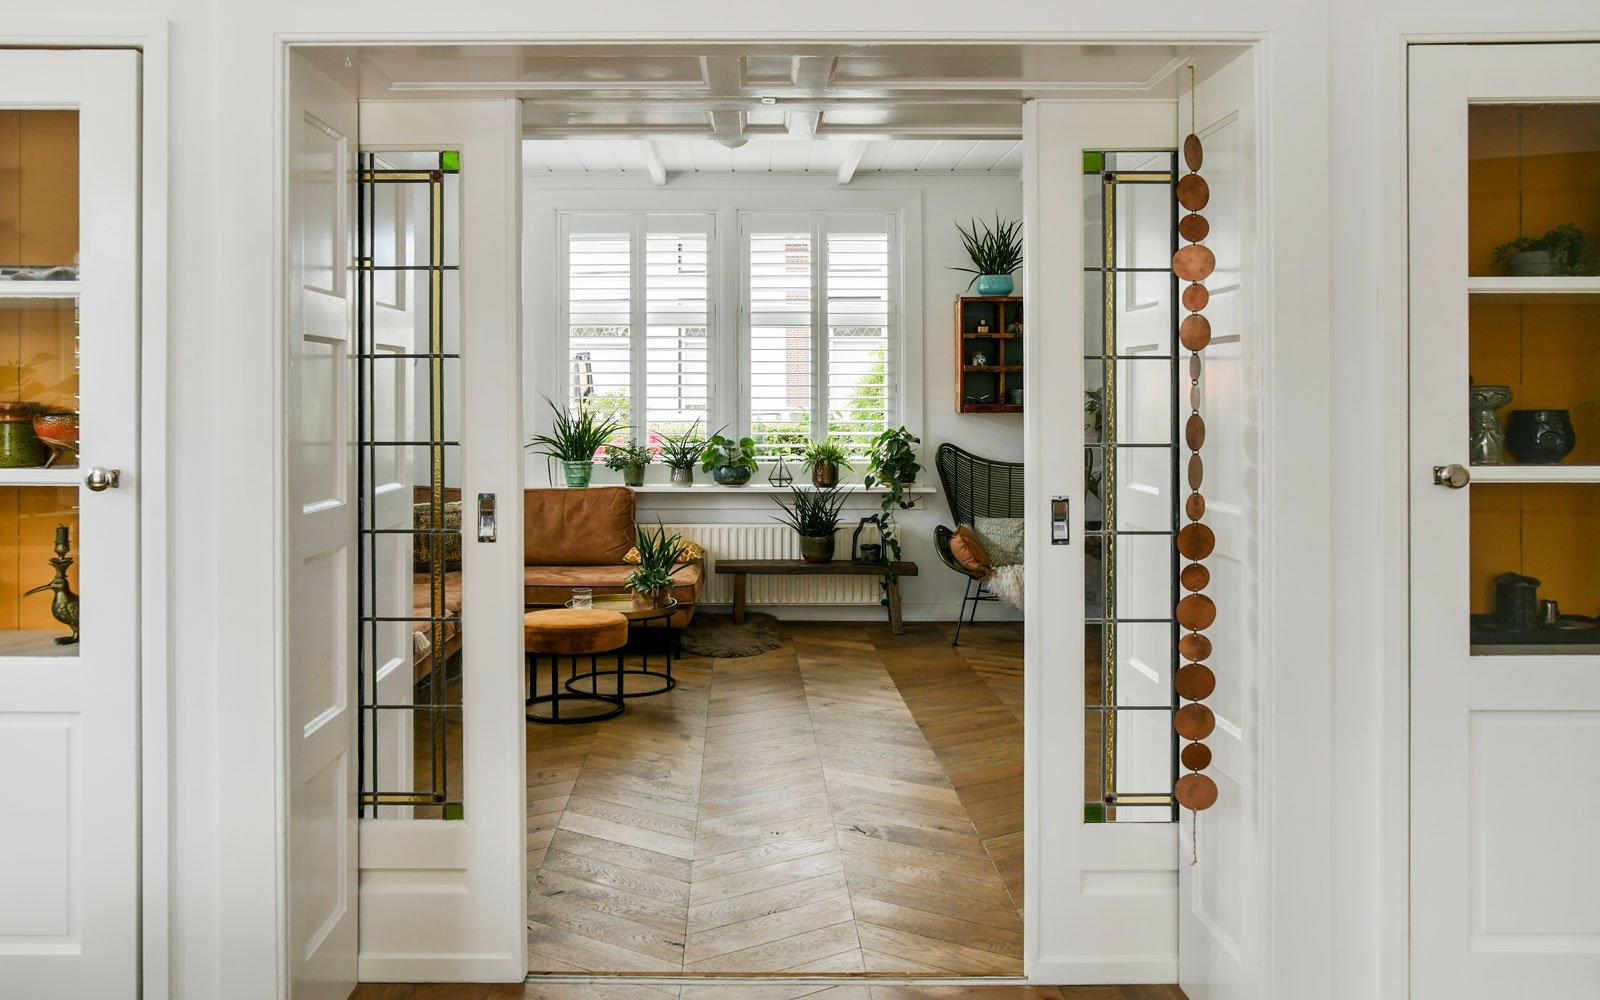 Maatwerkjaloezieën, Blend Window Fashion, ramen, shutters, decoratie, The Art of Living